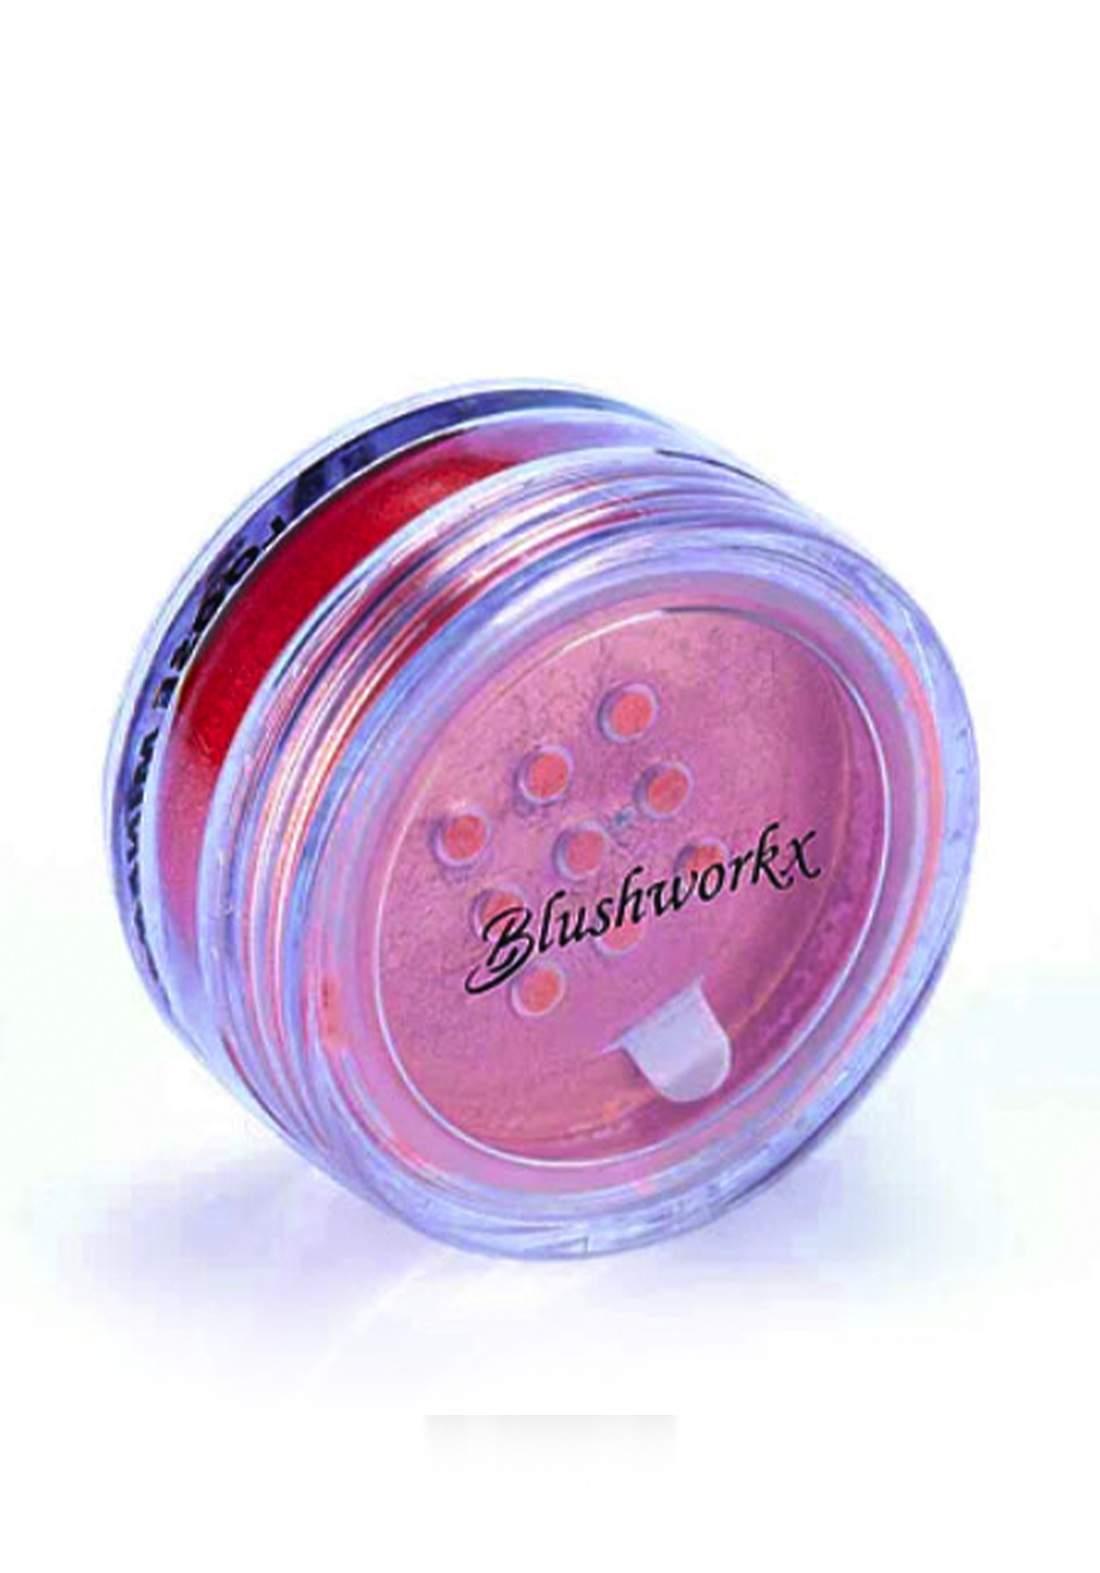 Blushworkx Hollywood Mineral Eye Dust No.6 Burnt Copper  1.5g ظلال للعيون